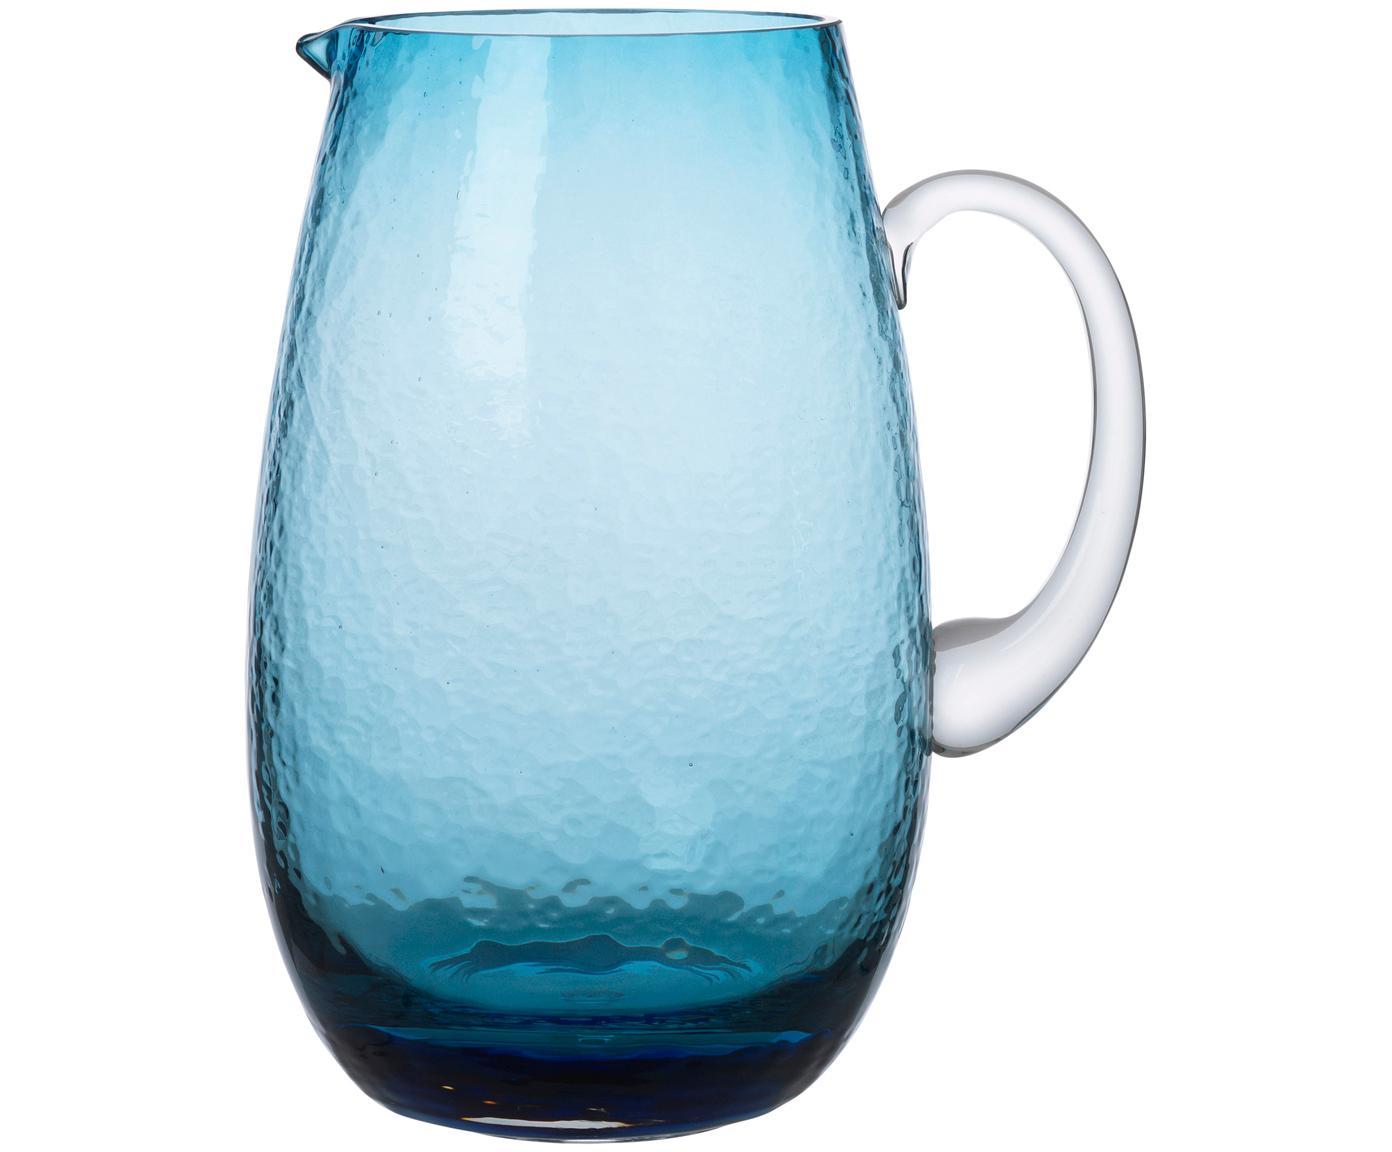 Mundgeblasener Krug Hammered, Glas, mundgeblasen, Blau, transparent, 2 L